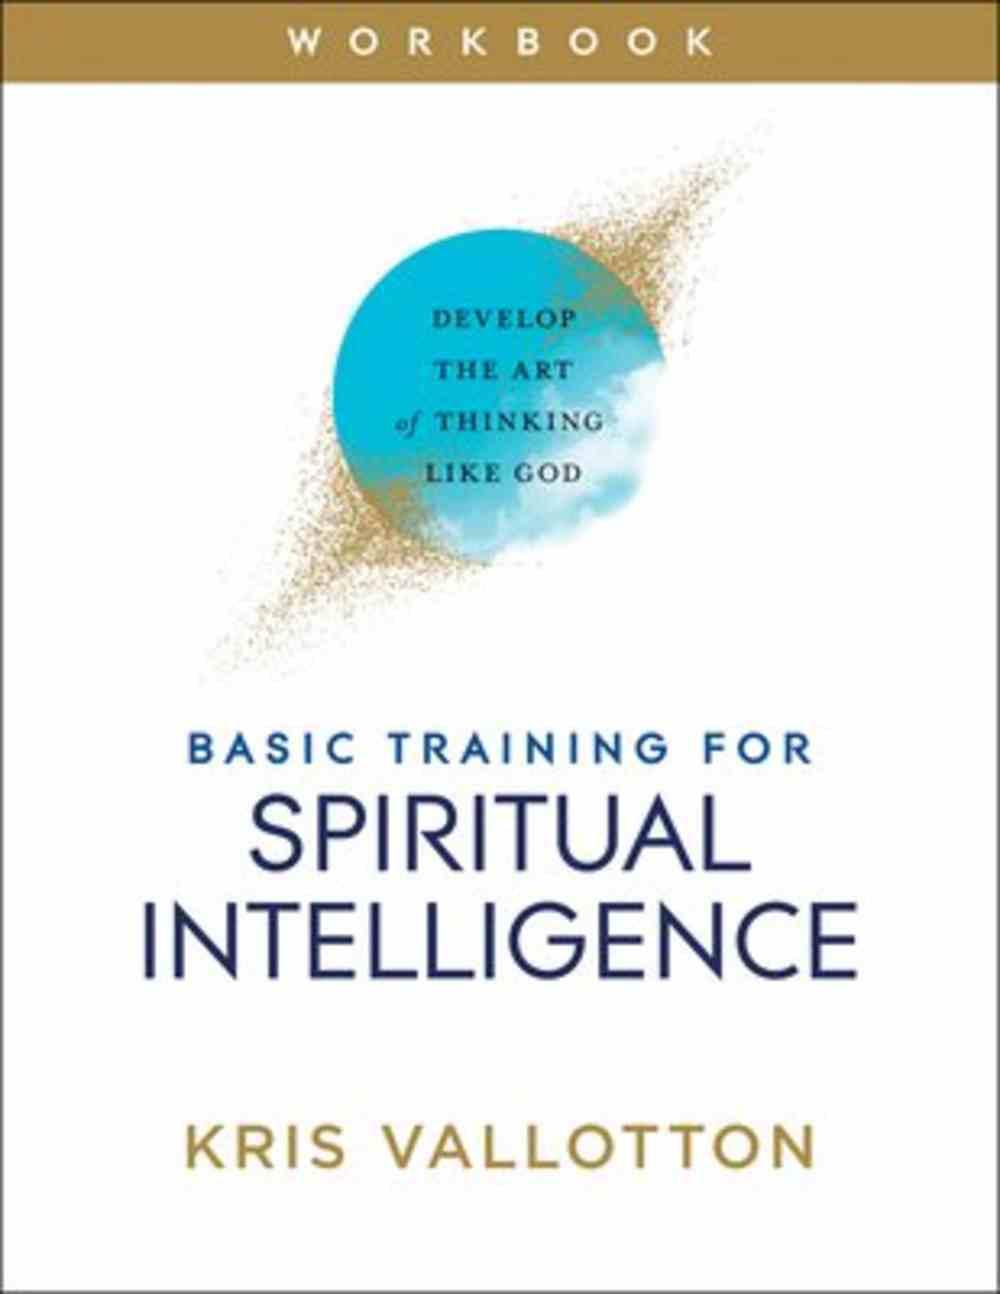 Basic Training For Spiritual Intelligence: Develop the Art of Thinking Like God Paperback